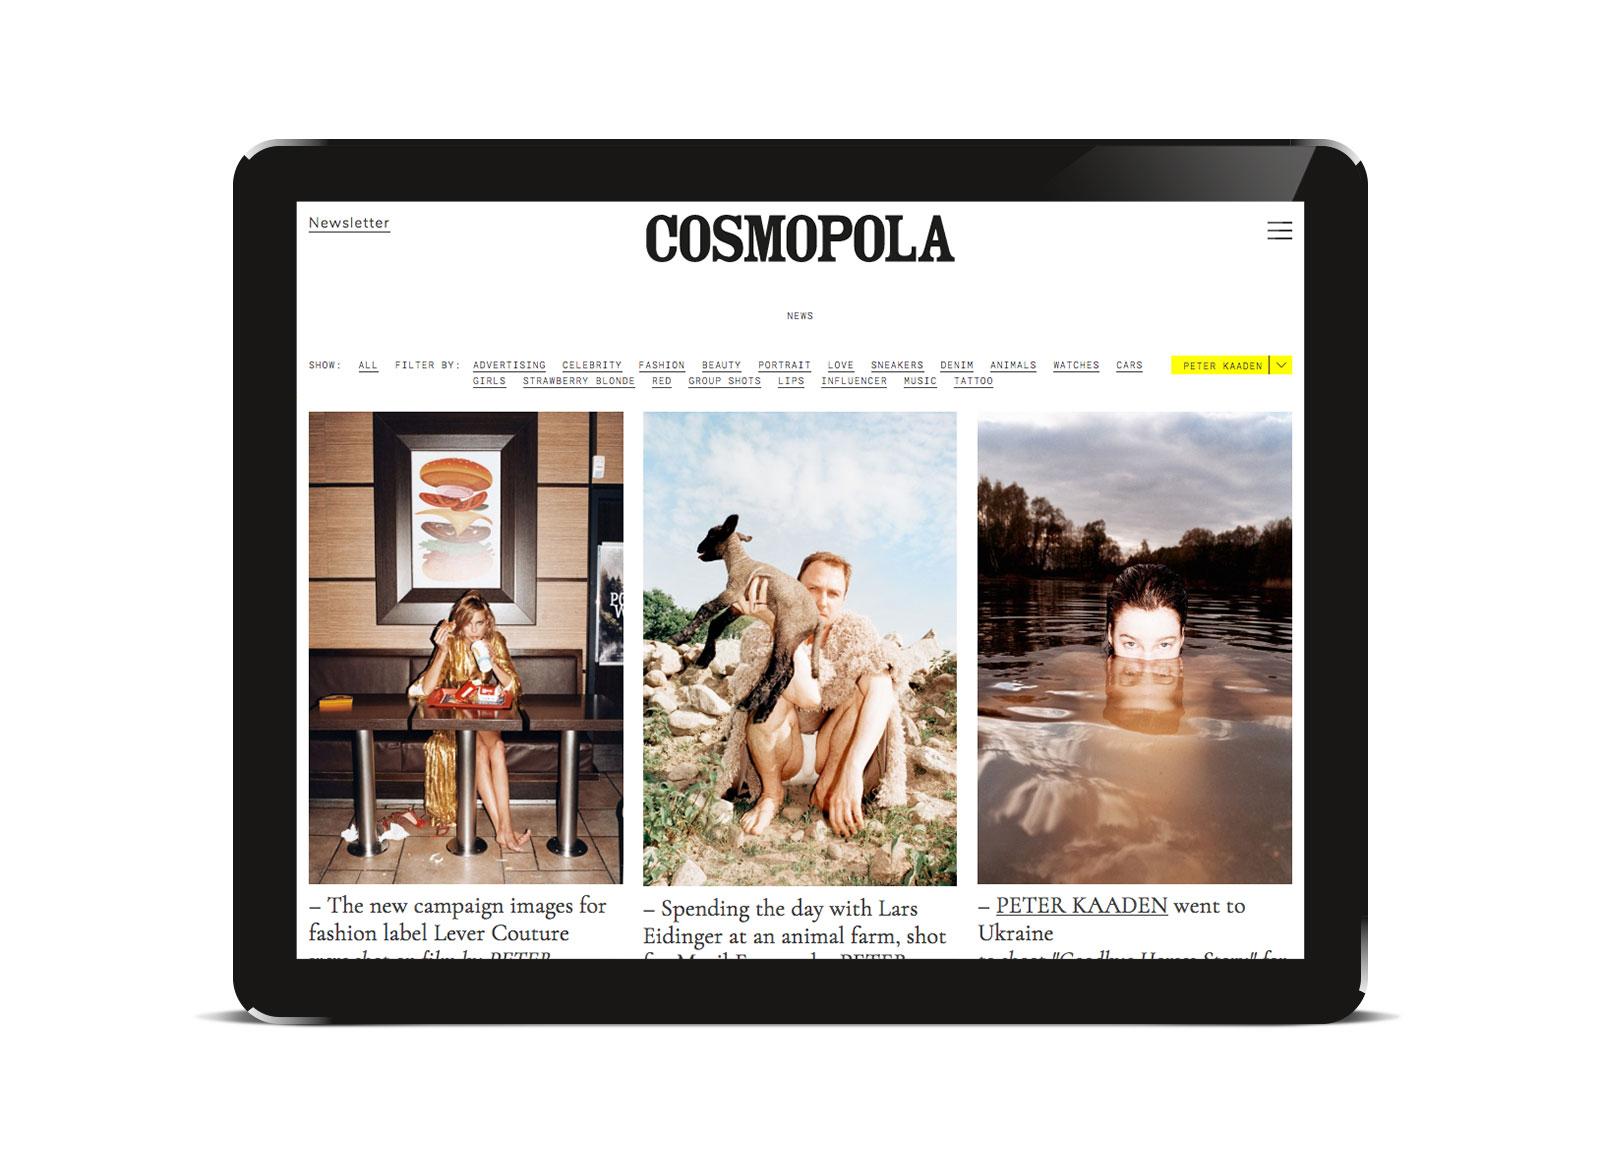 OLIVER MOORE Art Direction and Graphic Design  Torstrasse 98 10119 Berlin  studio@olivermoore.de +49 (0)30 40368971 Cosmopola Artist Management – Website